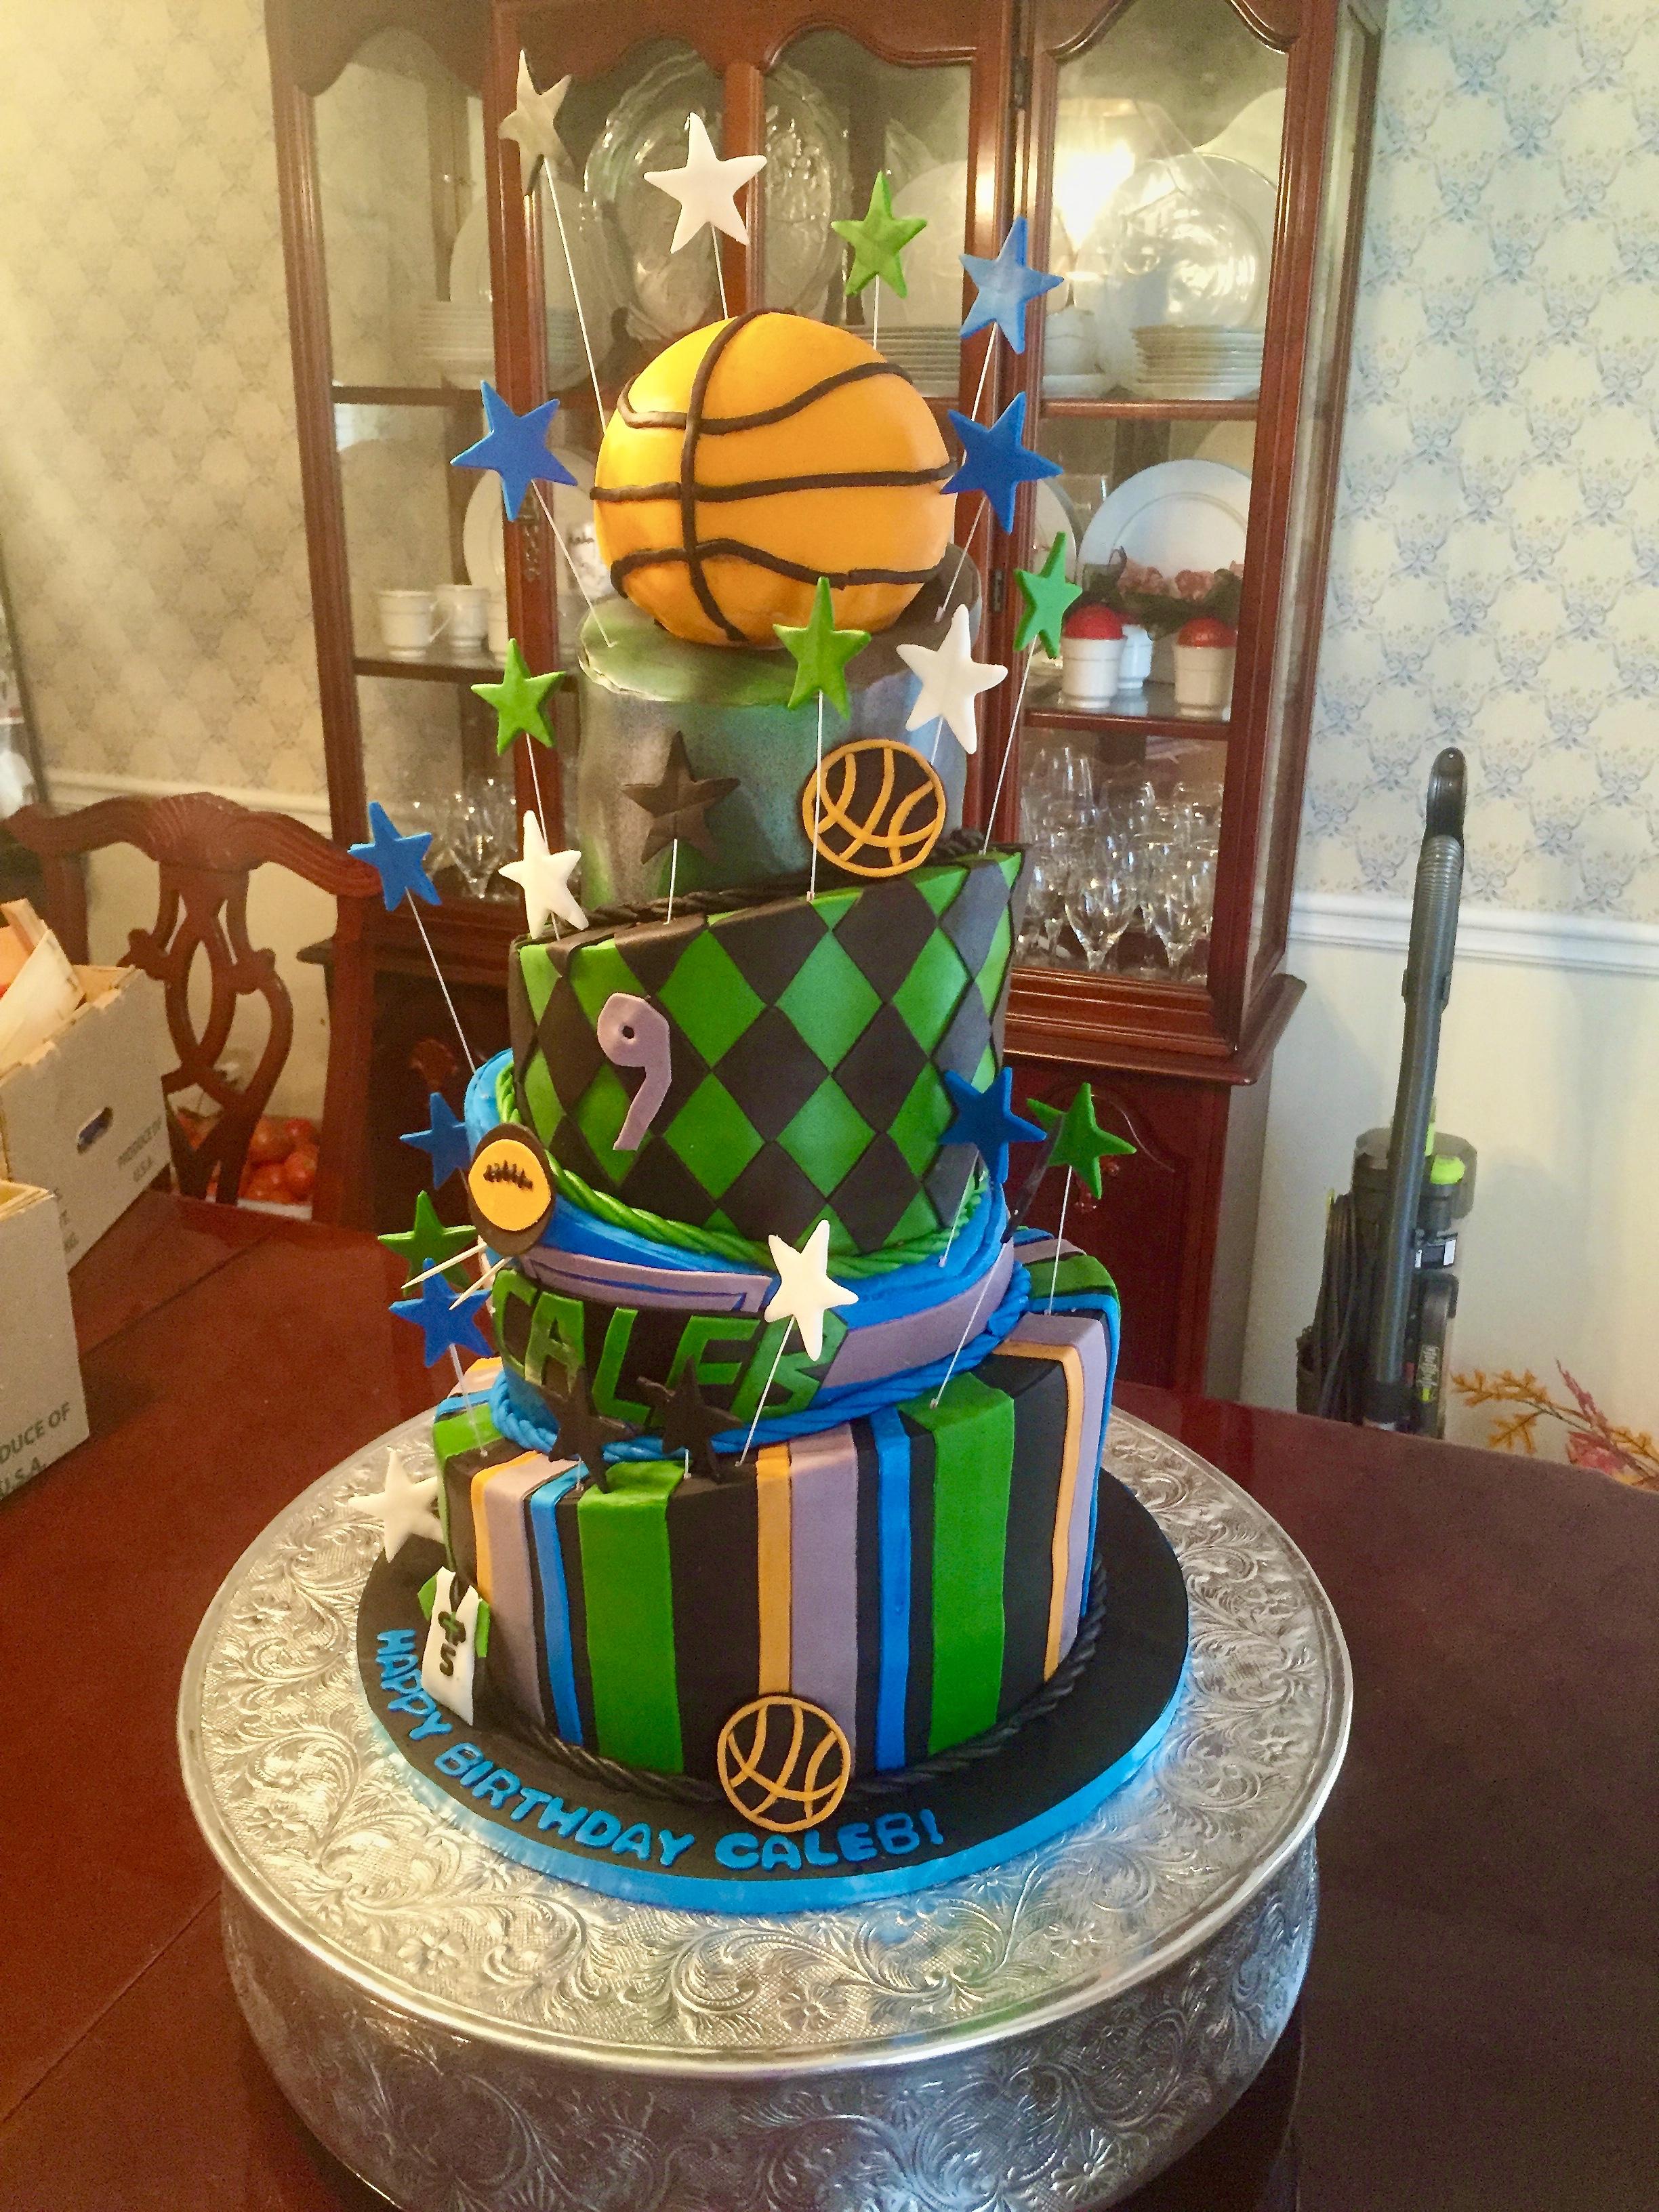 Topsy Turvy Basketball Cake